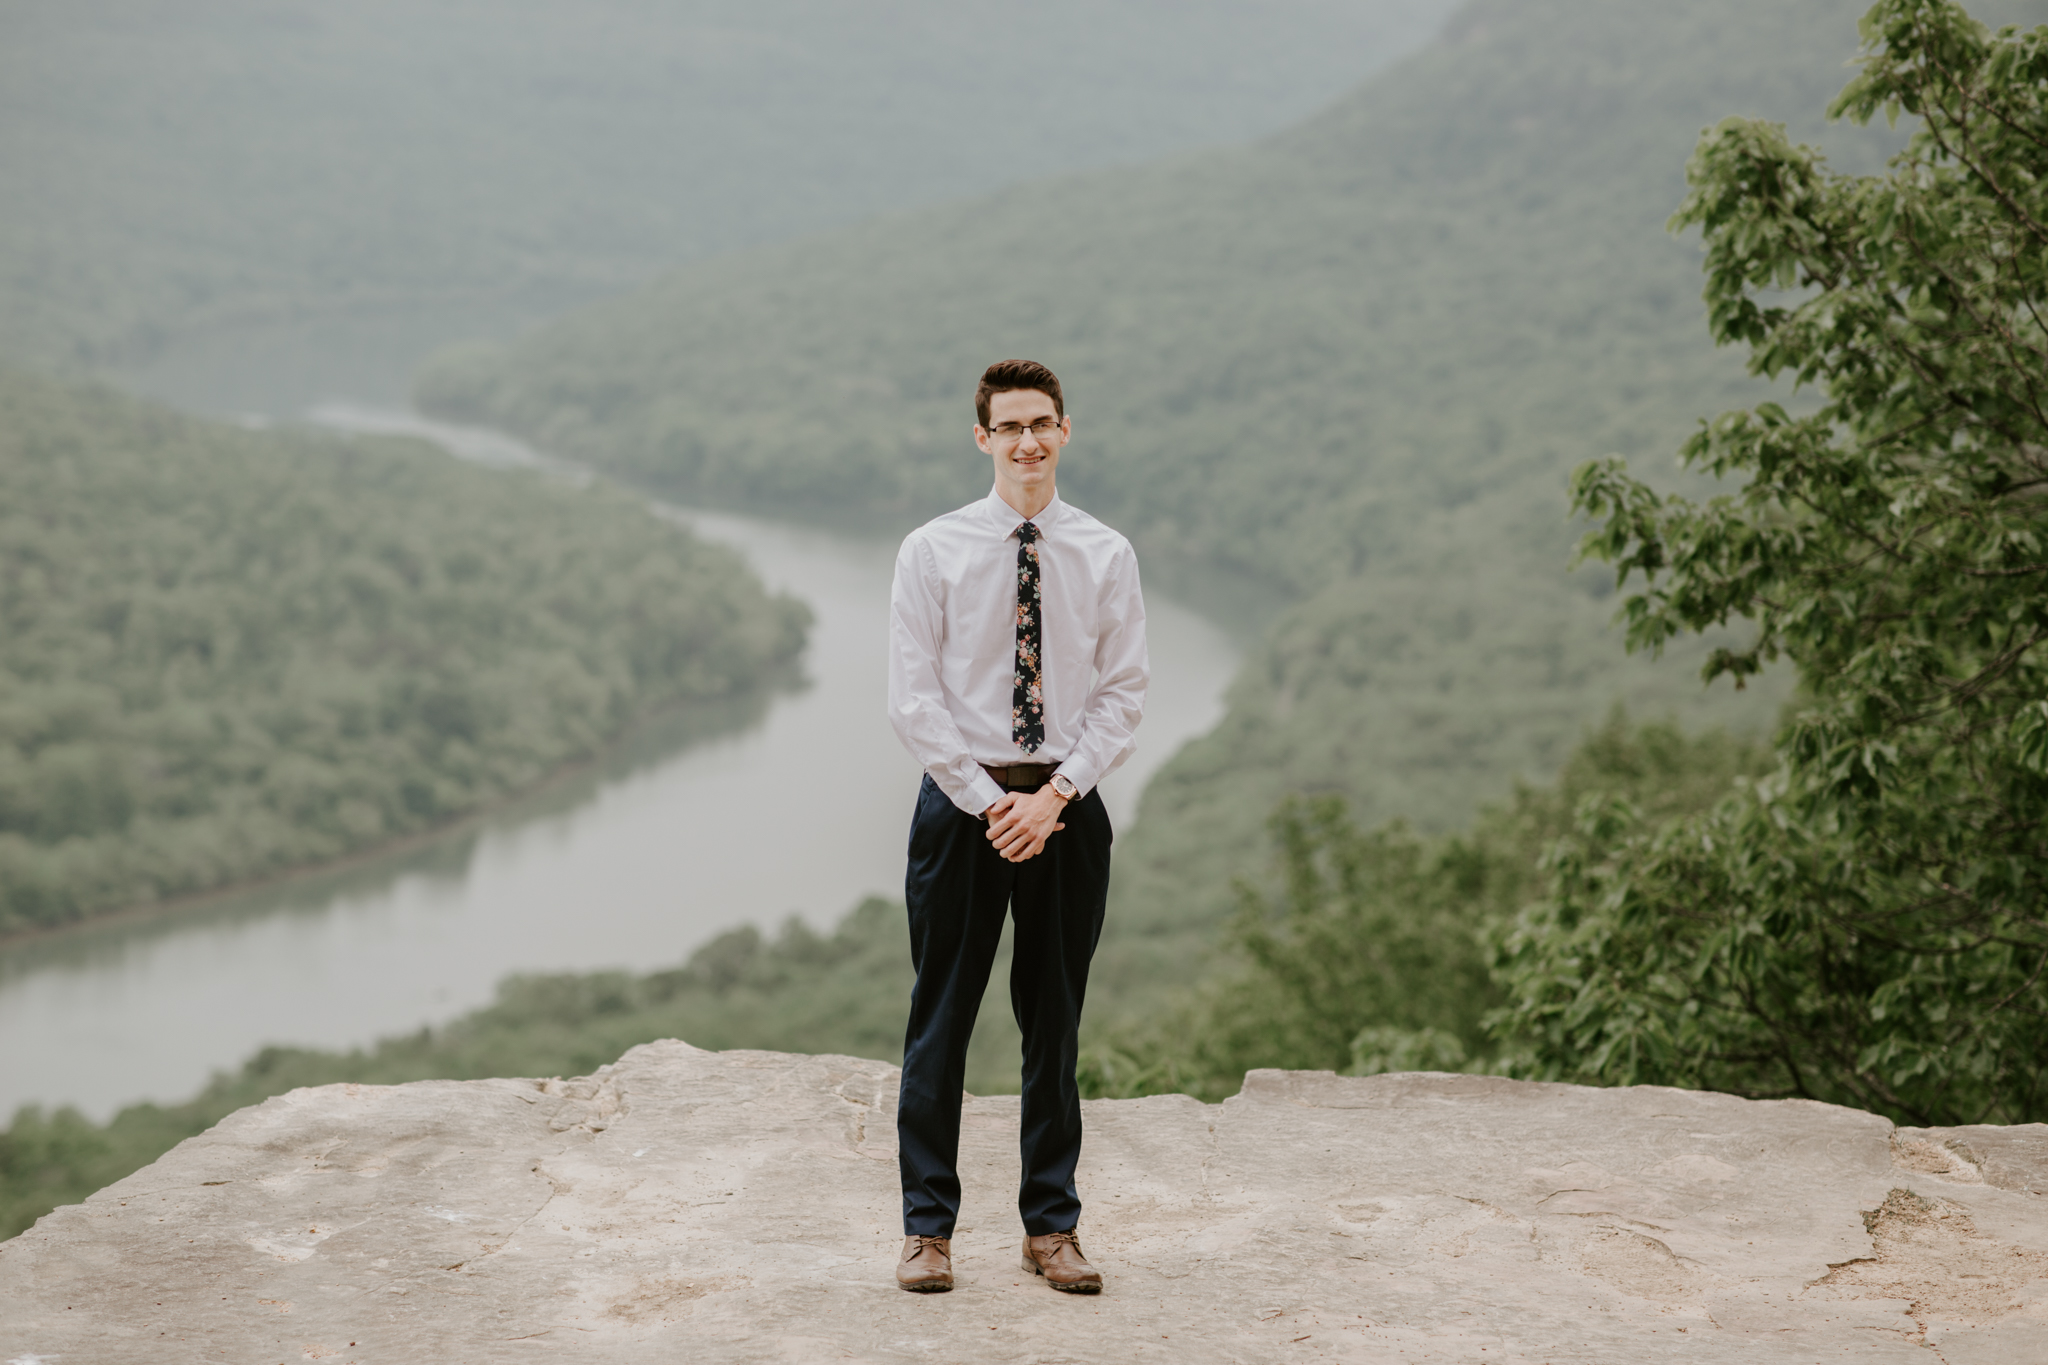 Lacey-Joe-Chattanooga-Nashville-Tennessee-Wedding-Elopement-Photographer-34.jpg